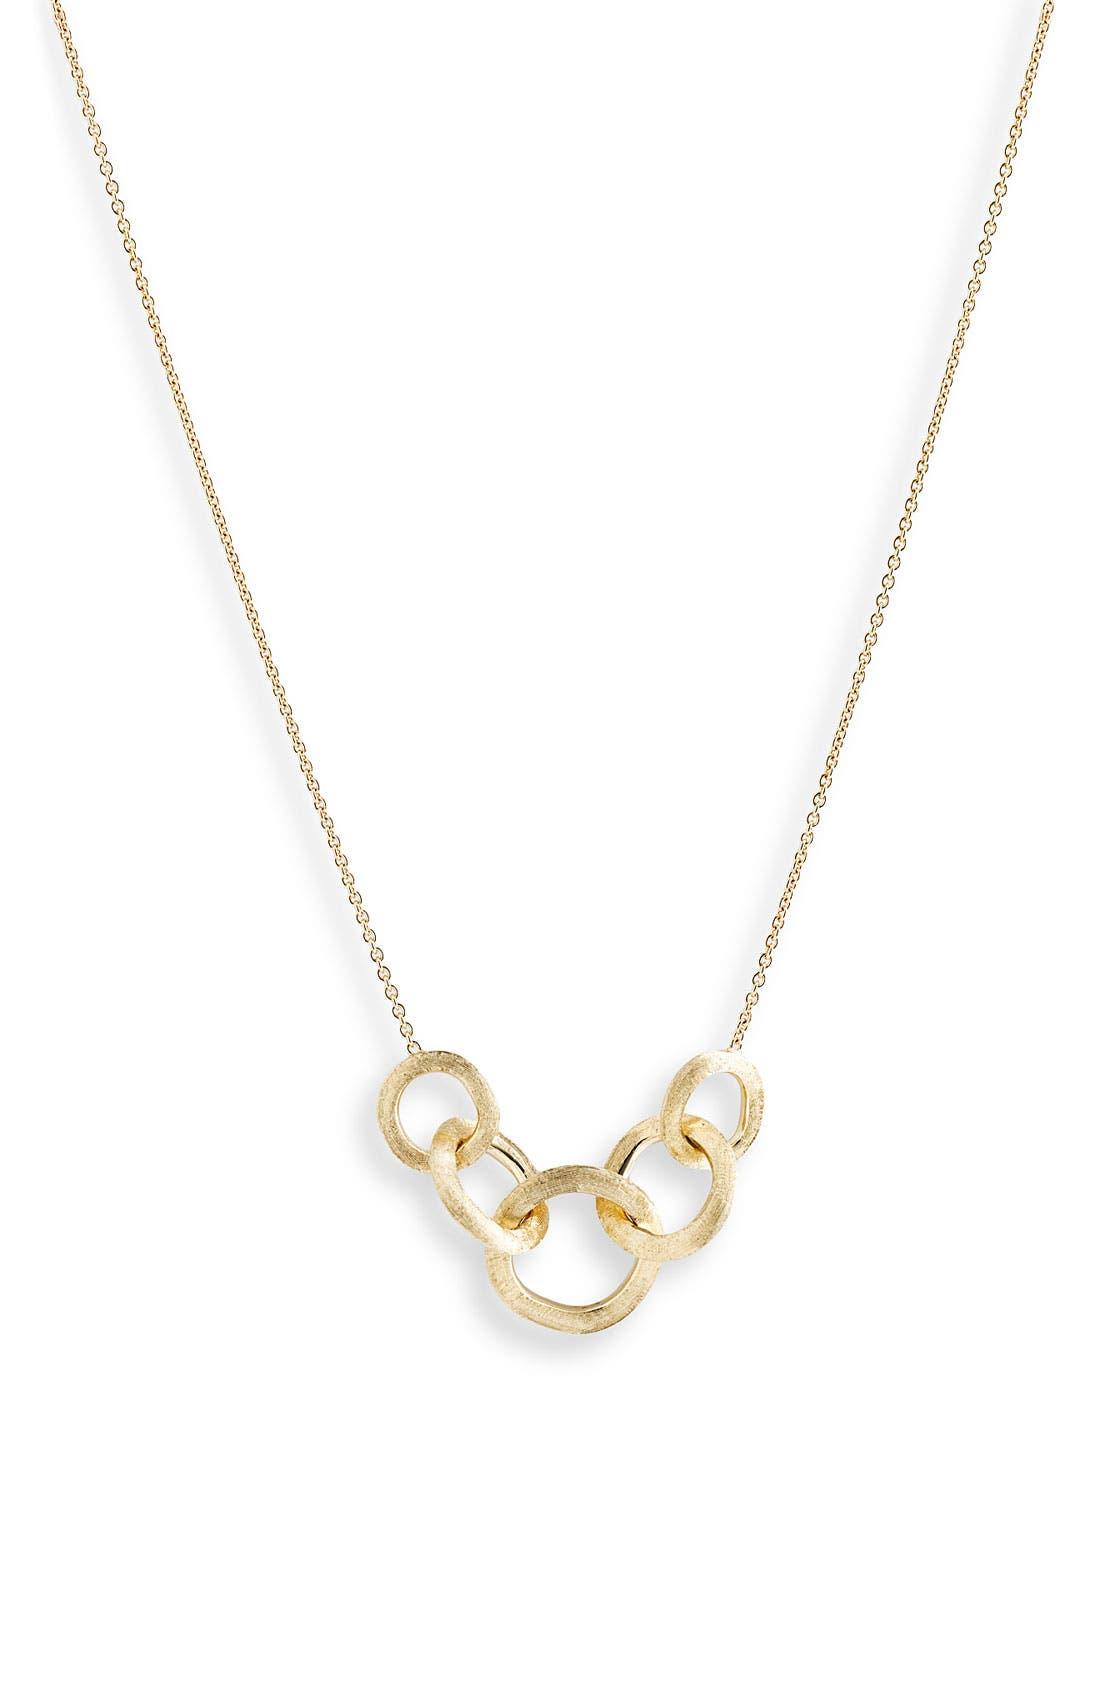 Marco Bicego 'Jaipur' Link Necklace